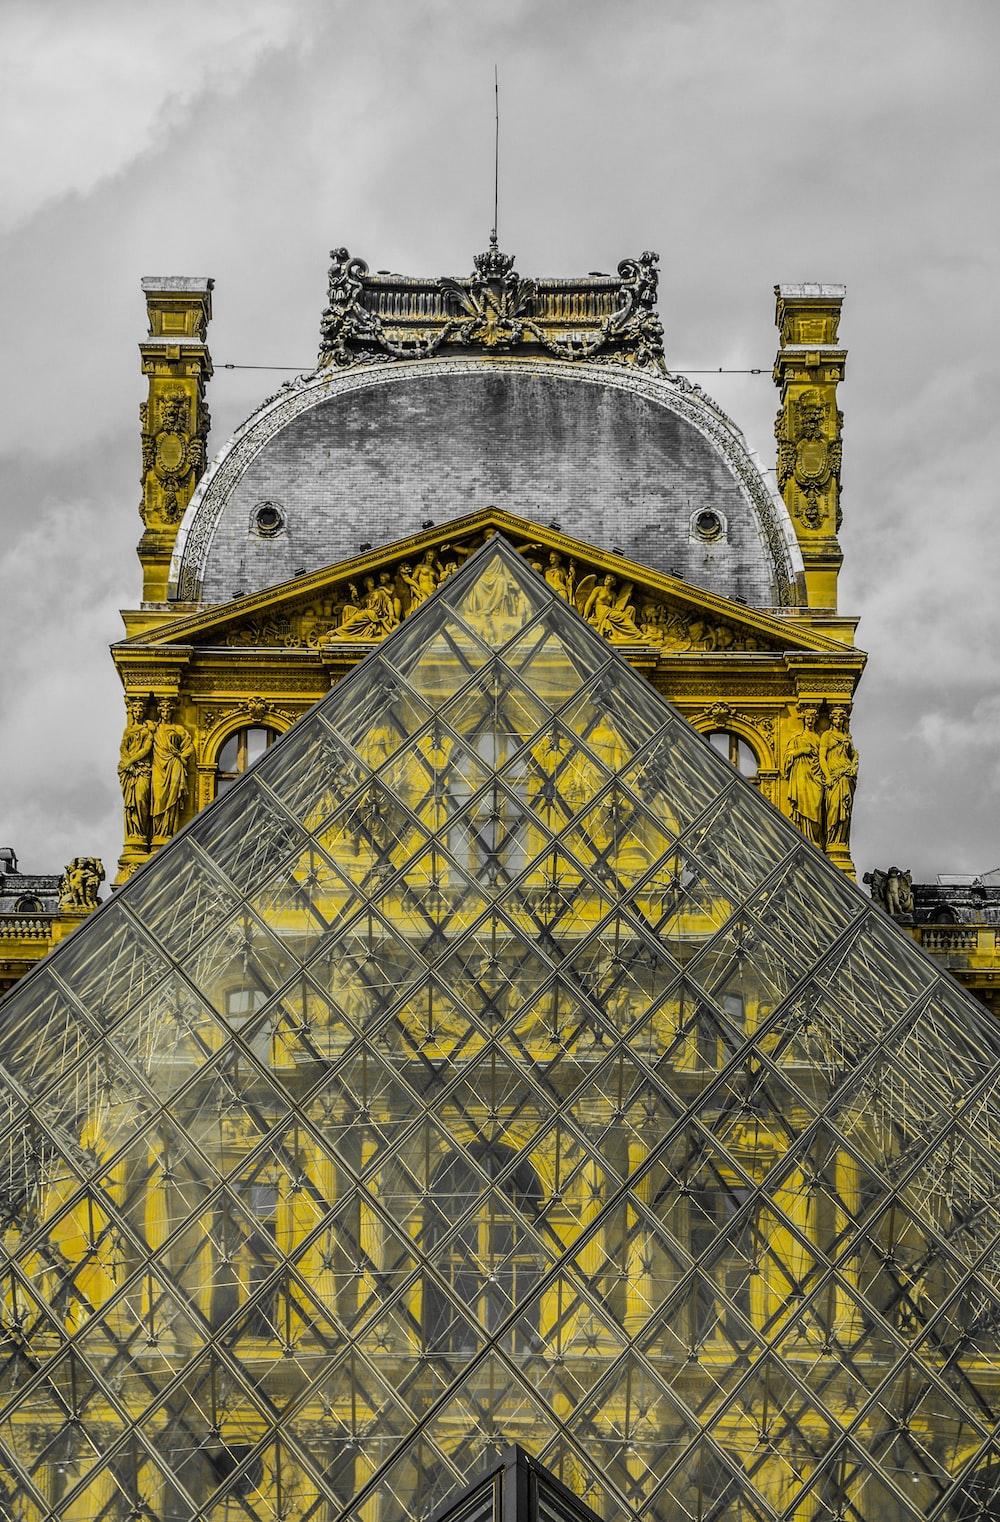 photo of glass triangle-shape building under nimbus cloud